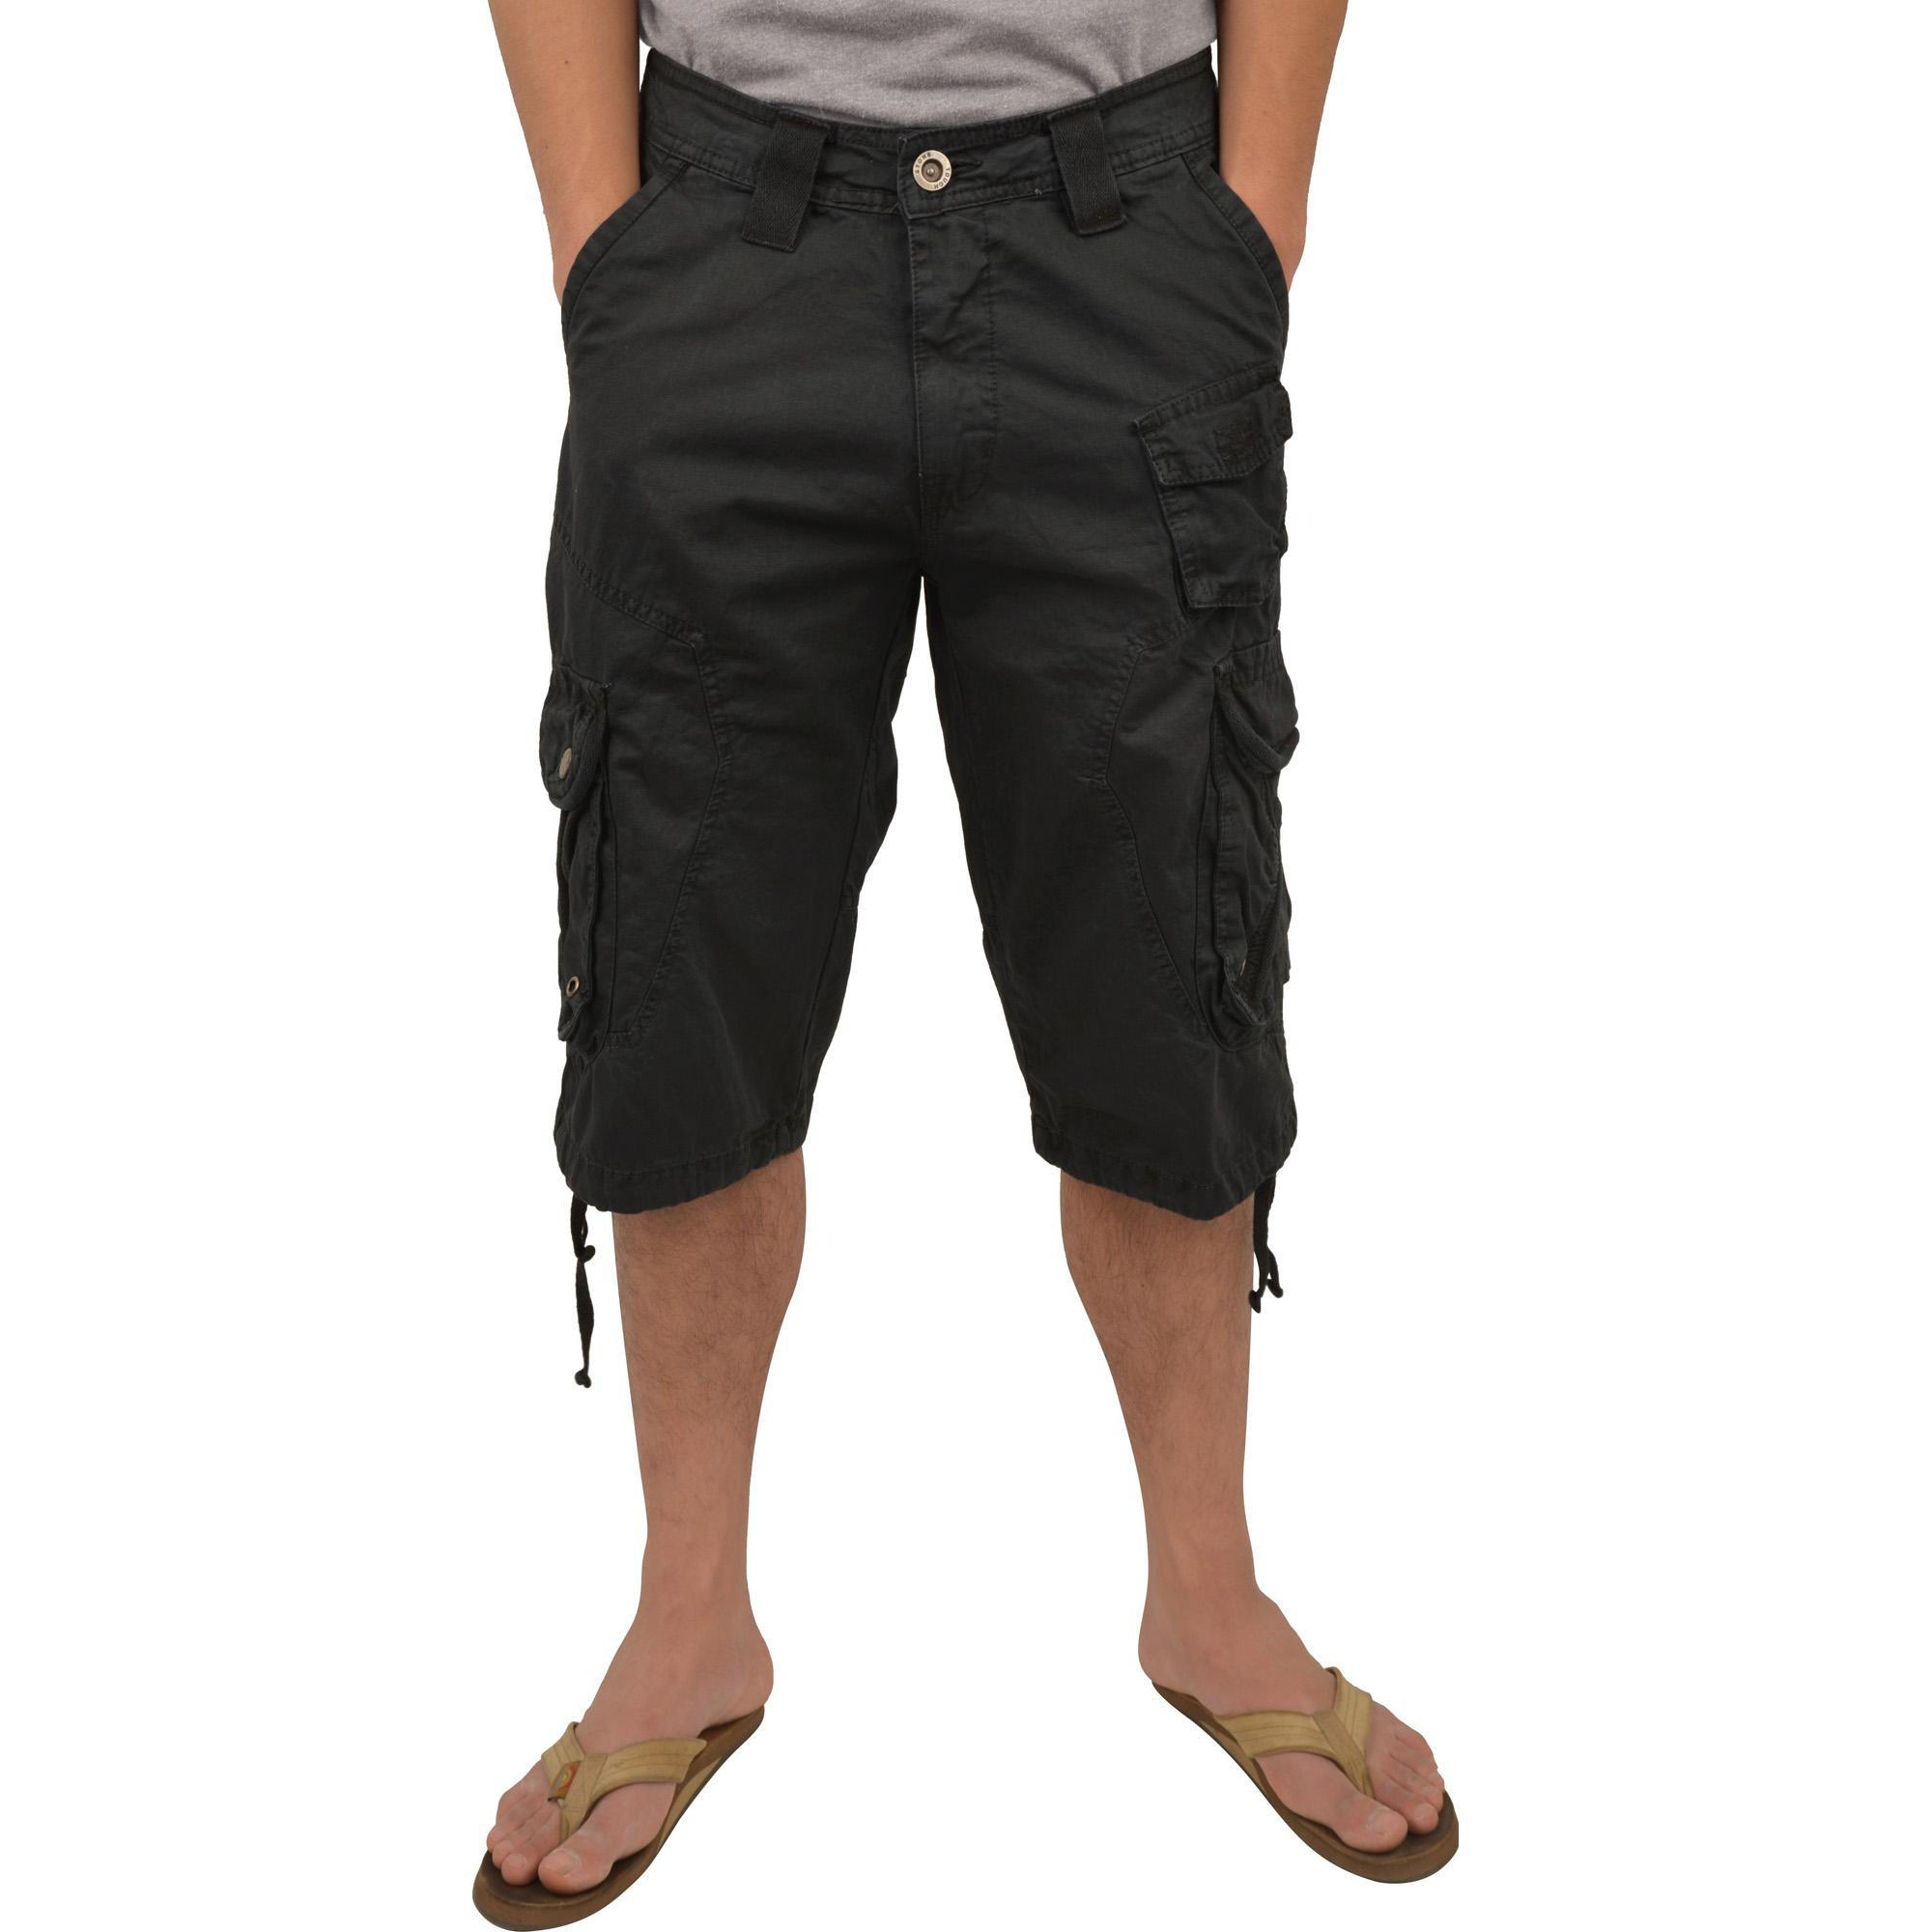 Mens Military Black Cargo Shorts #1048 Size 34